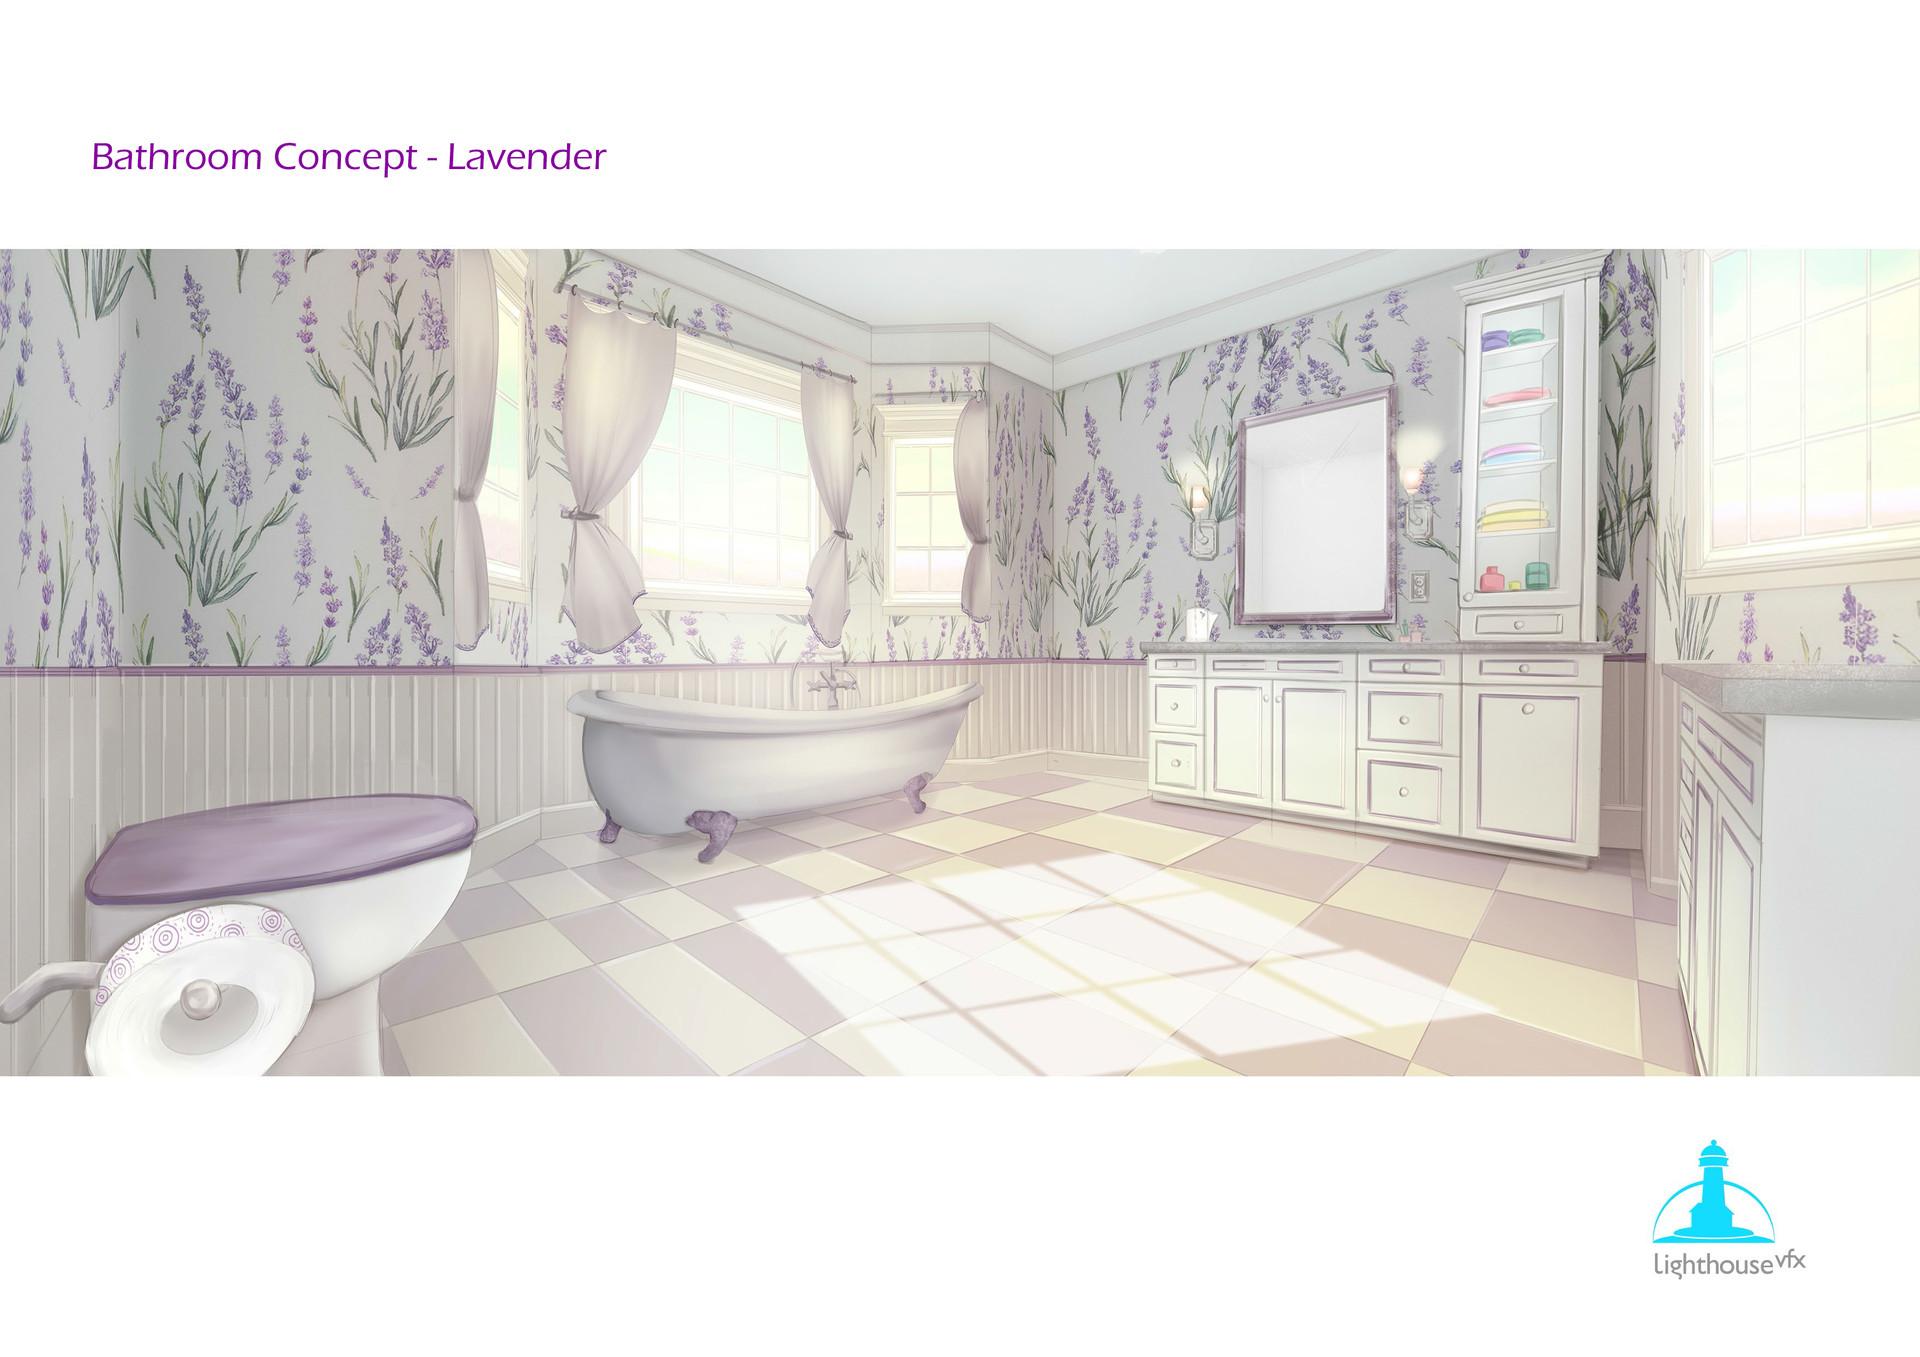 Lavender Bathroom Concept Design.